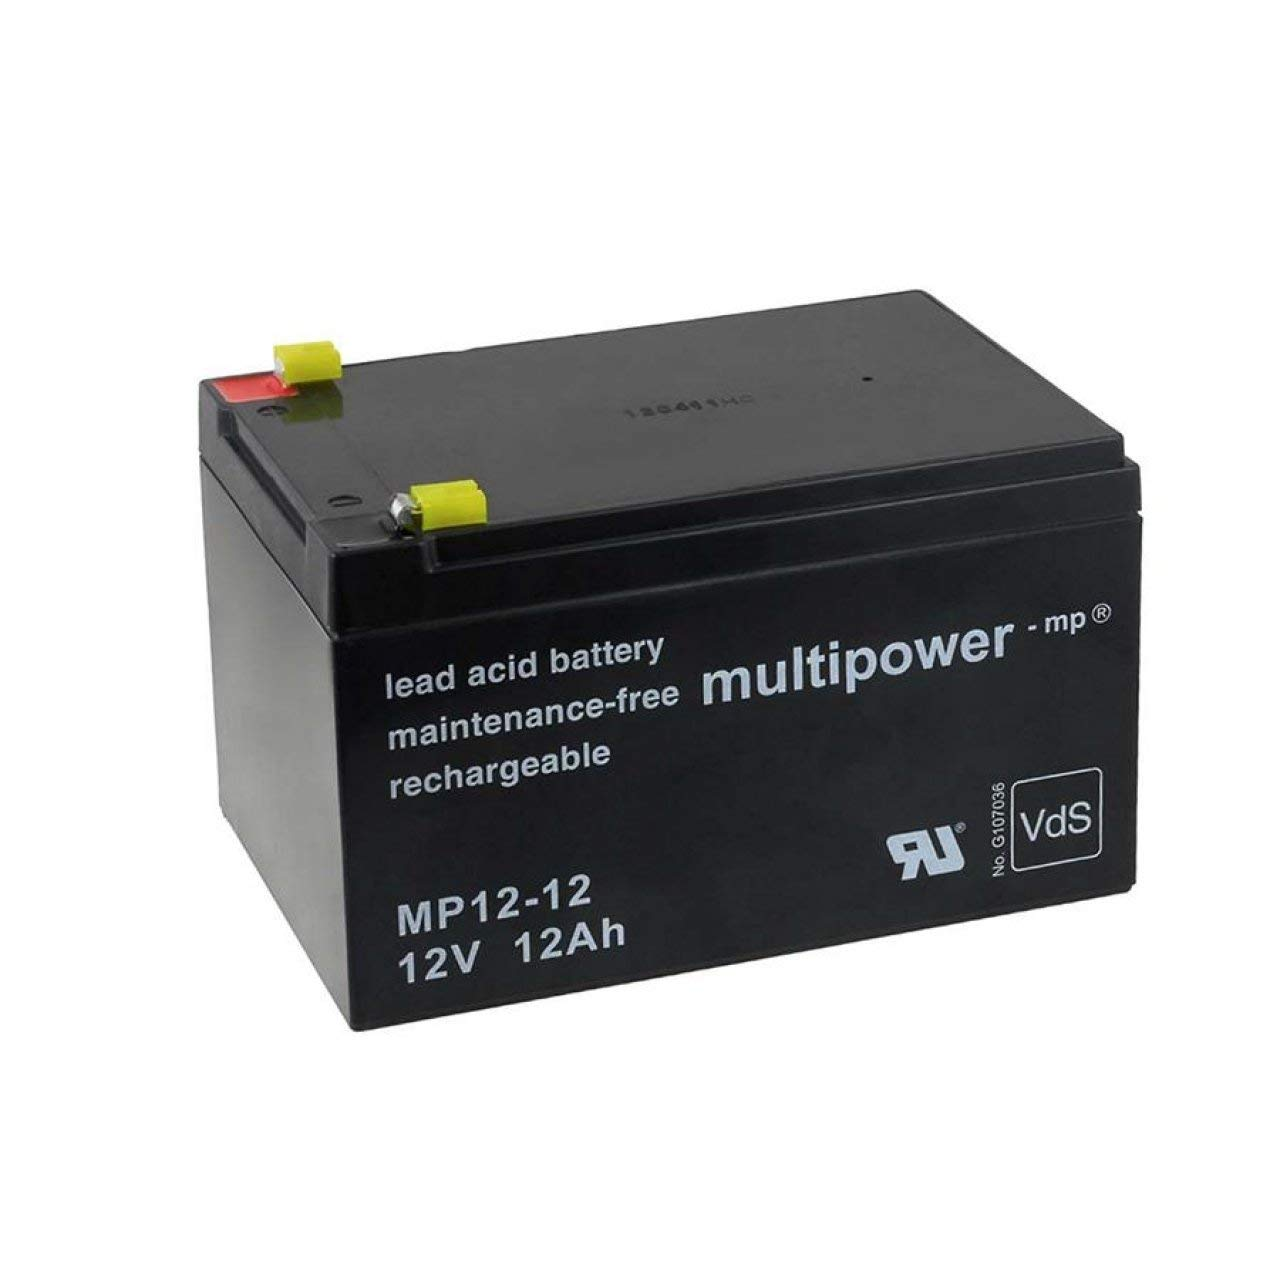 Powery Recambio de Bater/ía para Smart-UPS SC 620